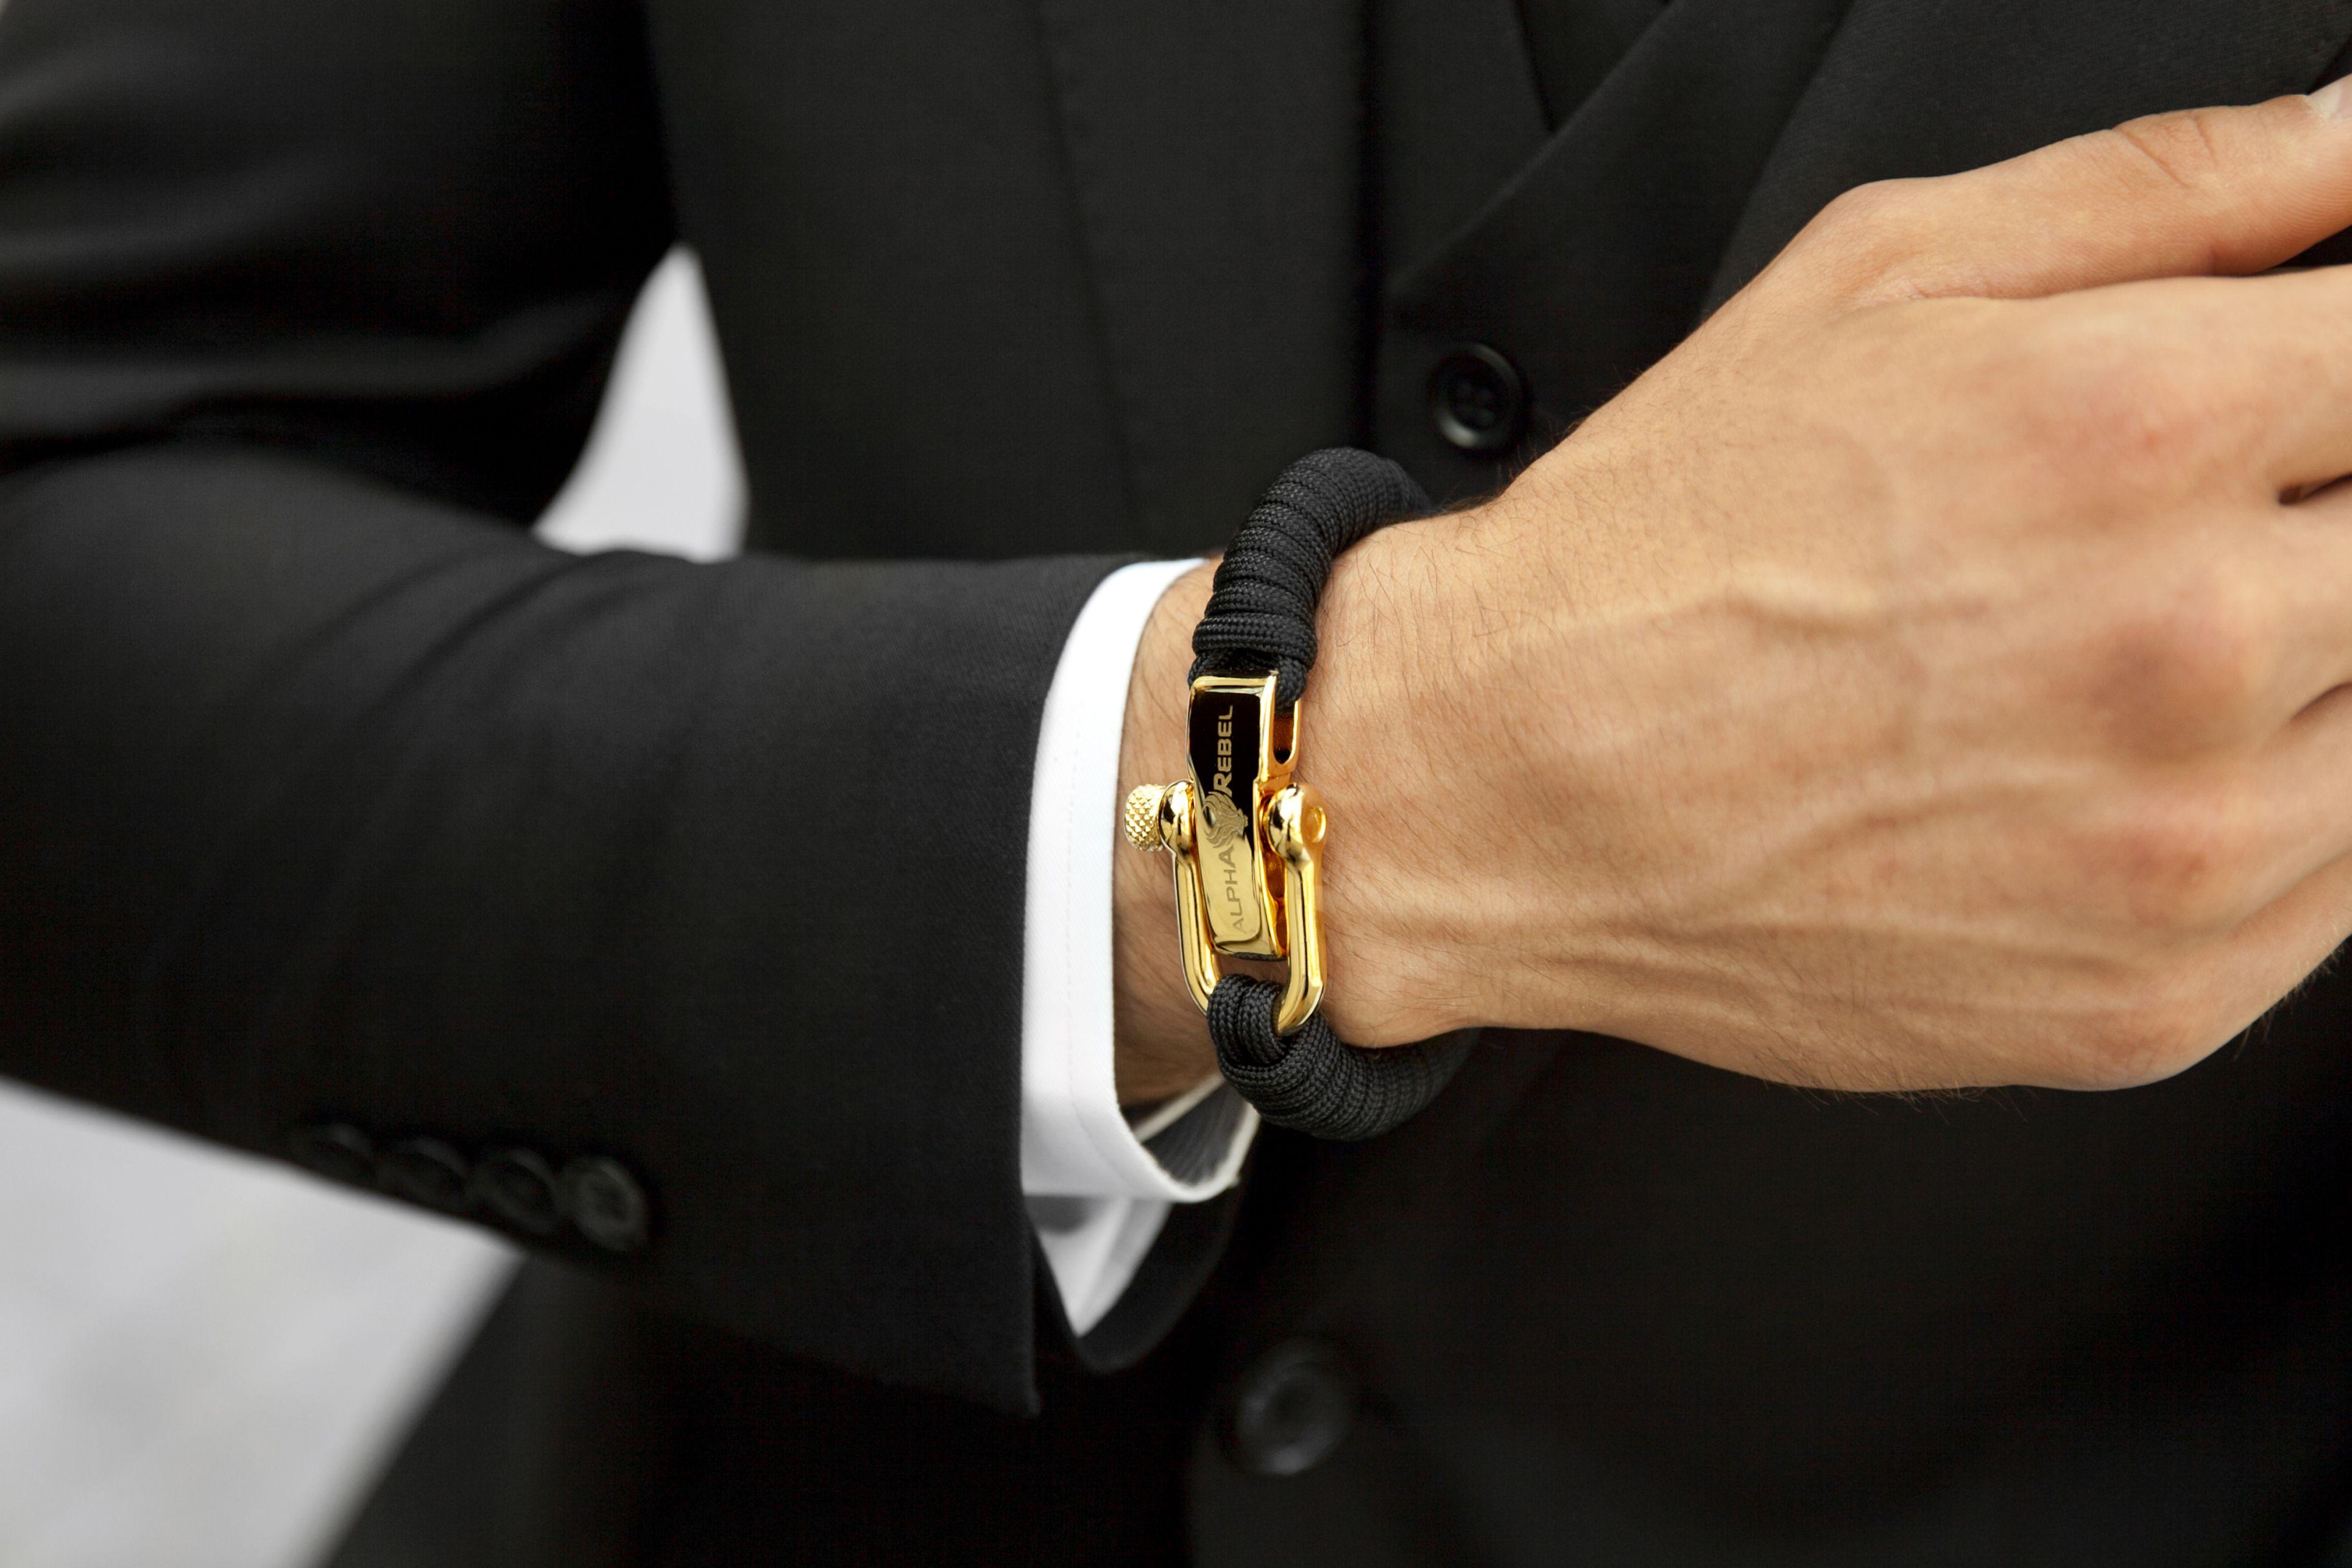 KCUF™ Slim 18K Gold / Black Paracord bracelets, Men